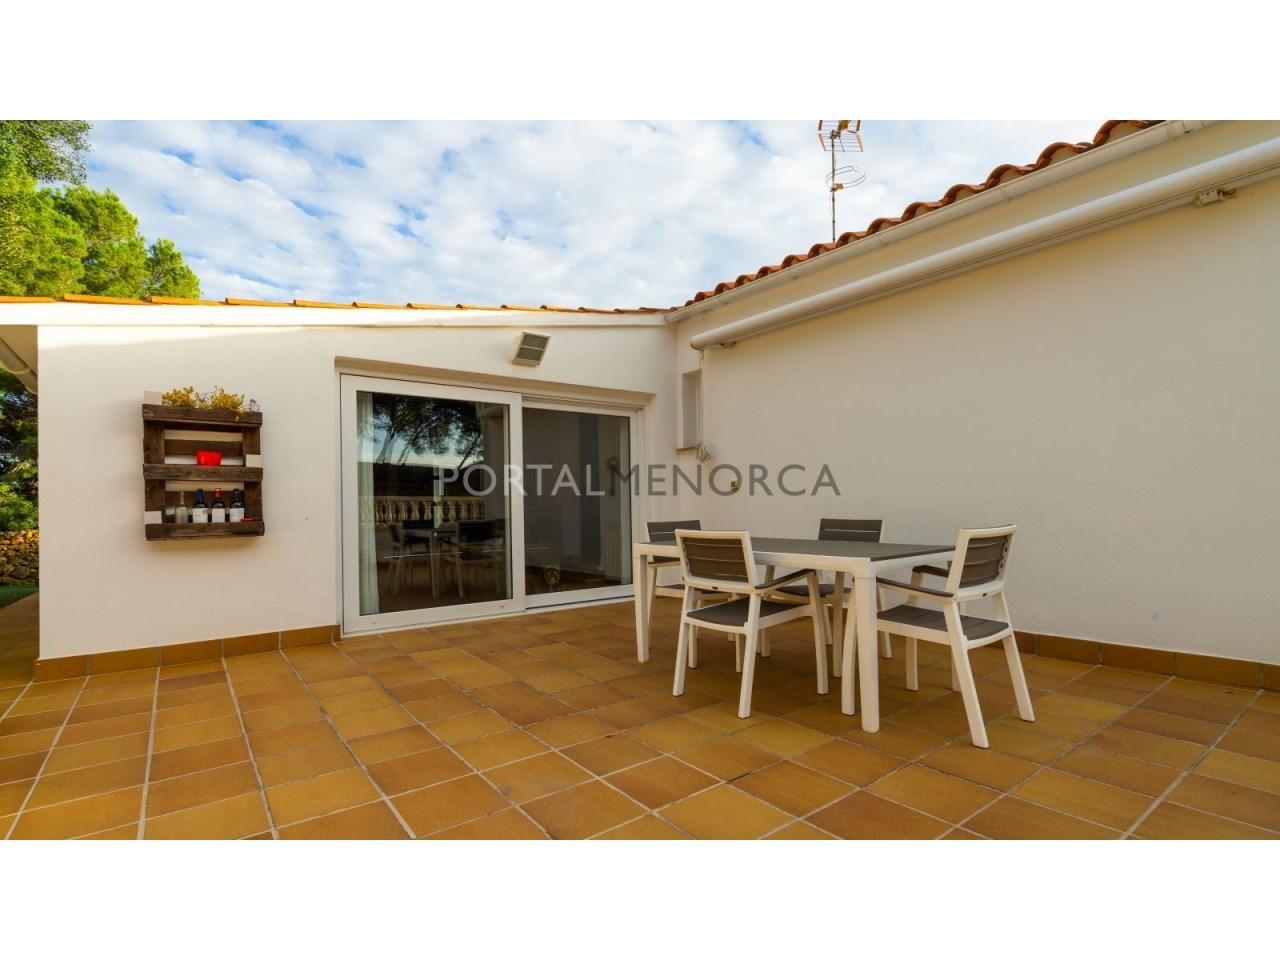 inmobilier-acheter-menorca-minorque (2)